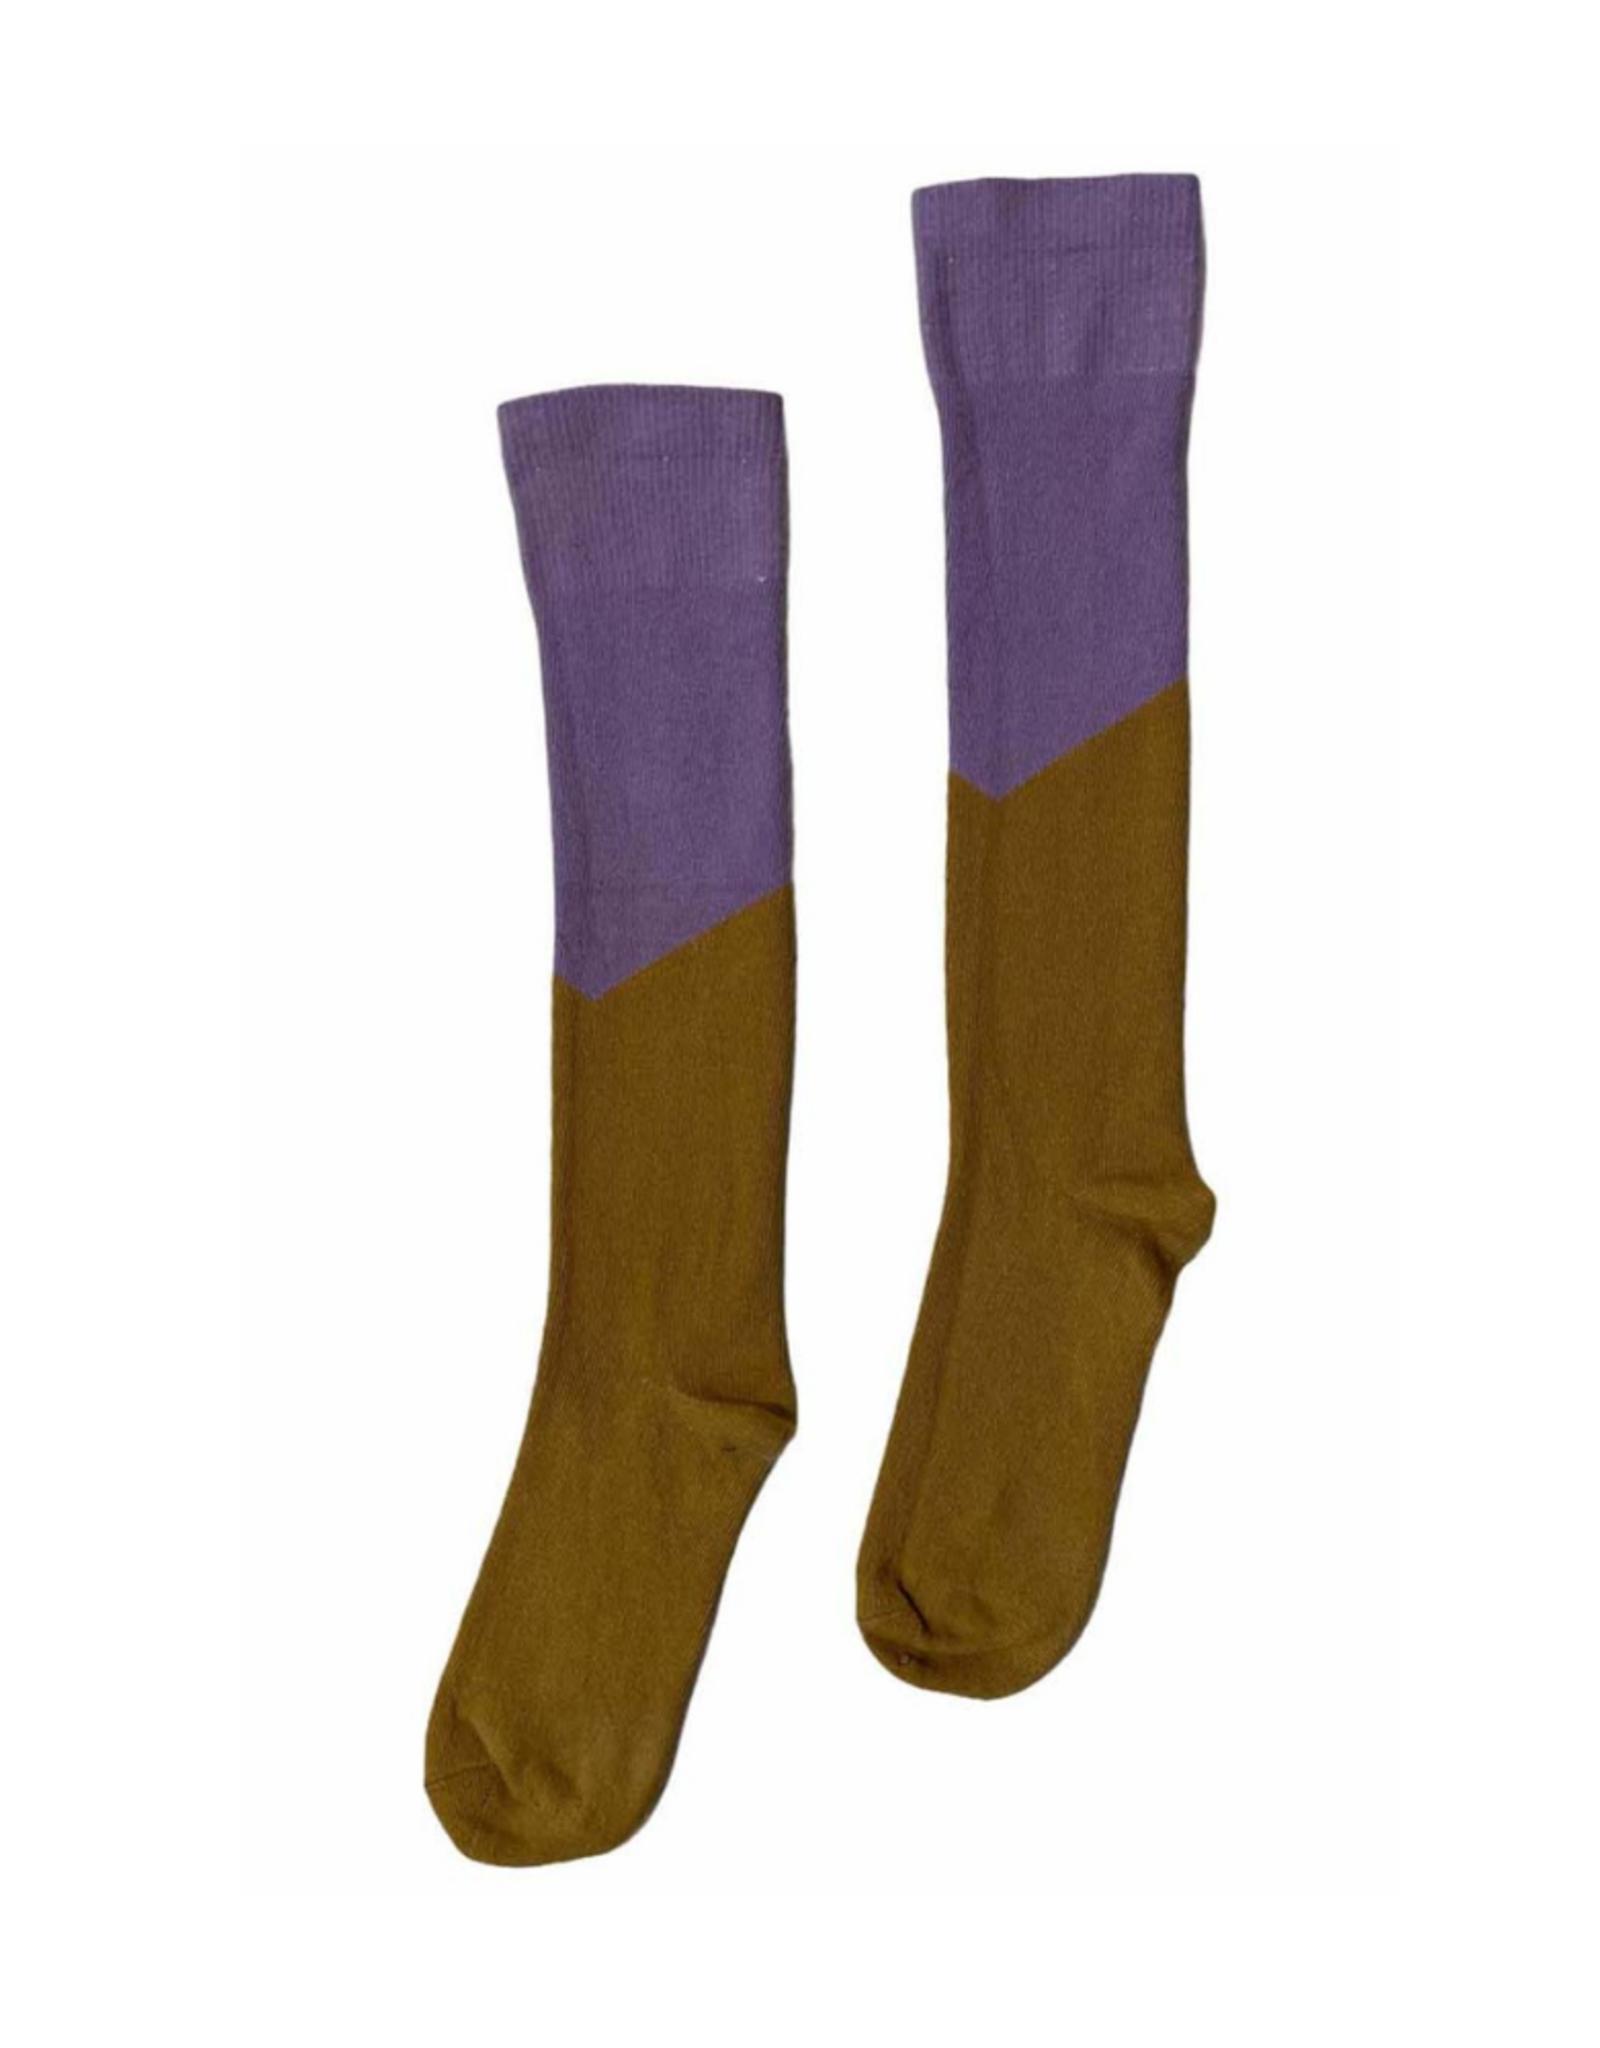 Topitm TOPitm socks Camille sand/lilac